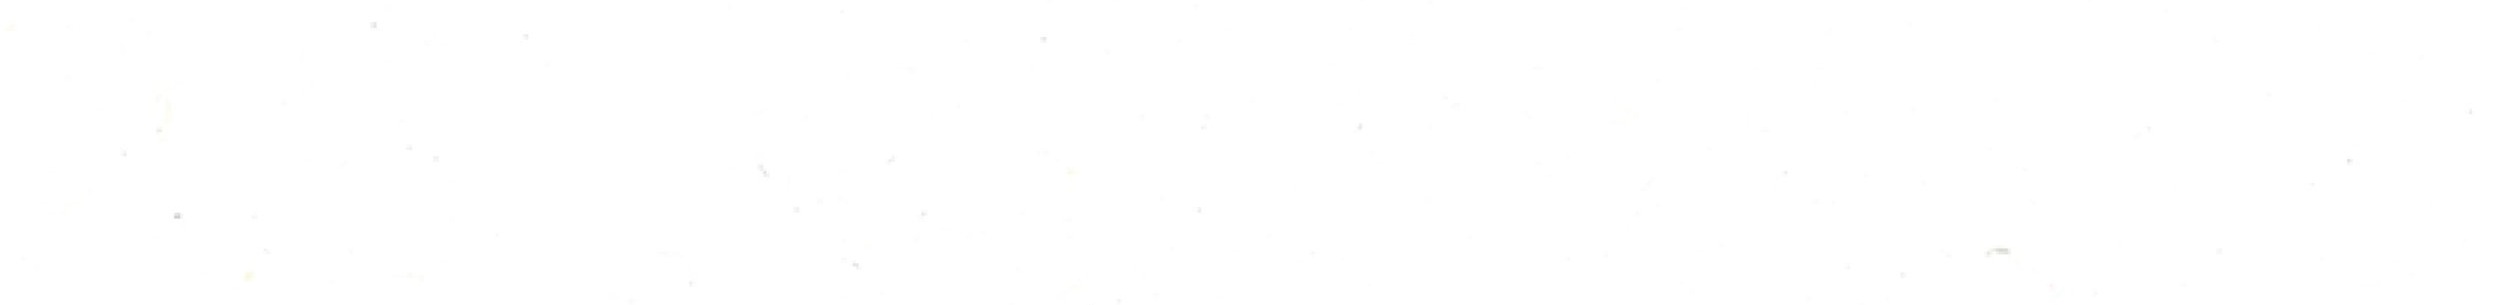 viviana-Troya-blank2.jpg